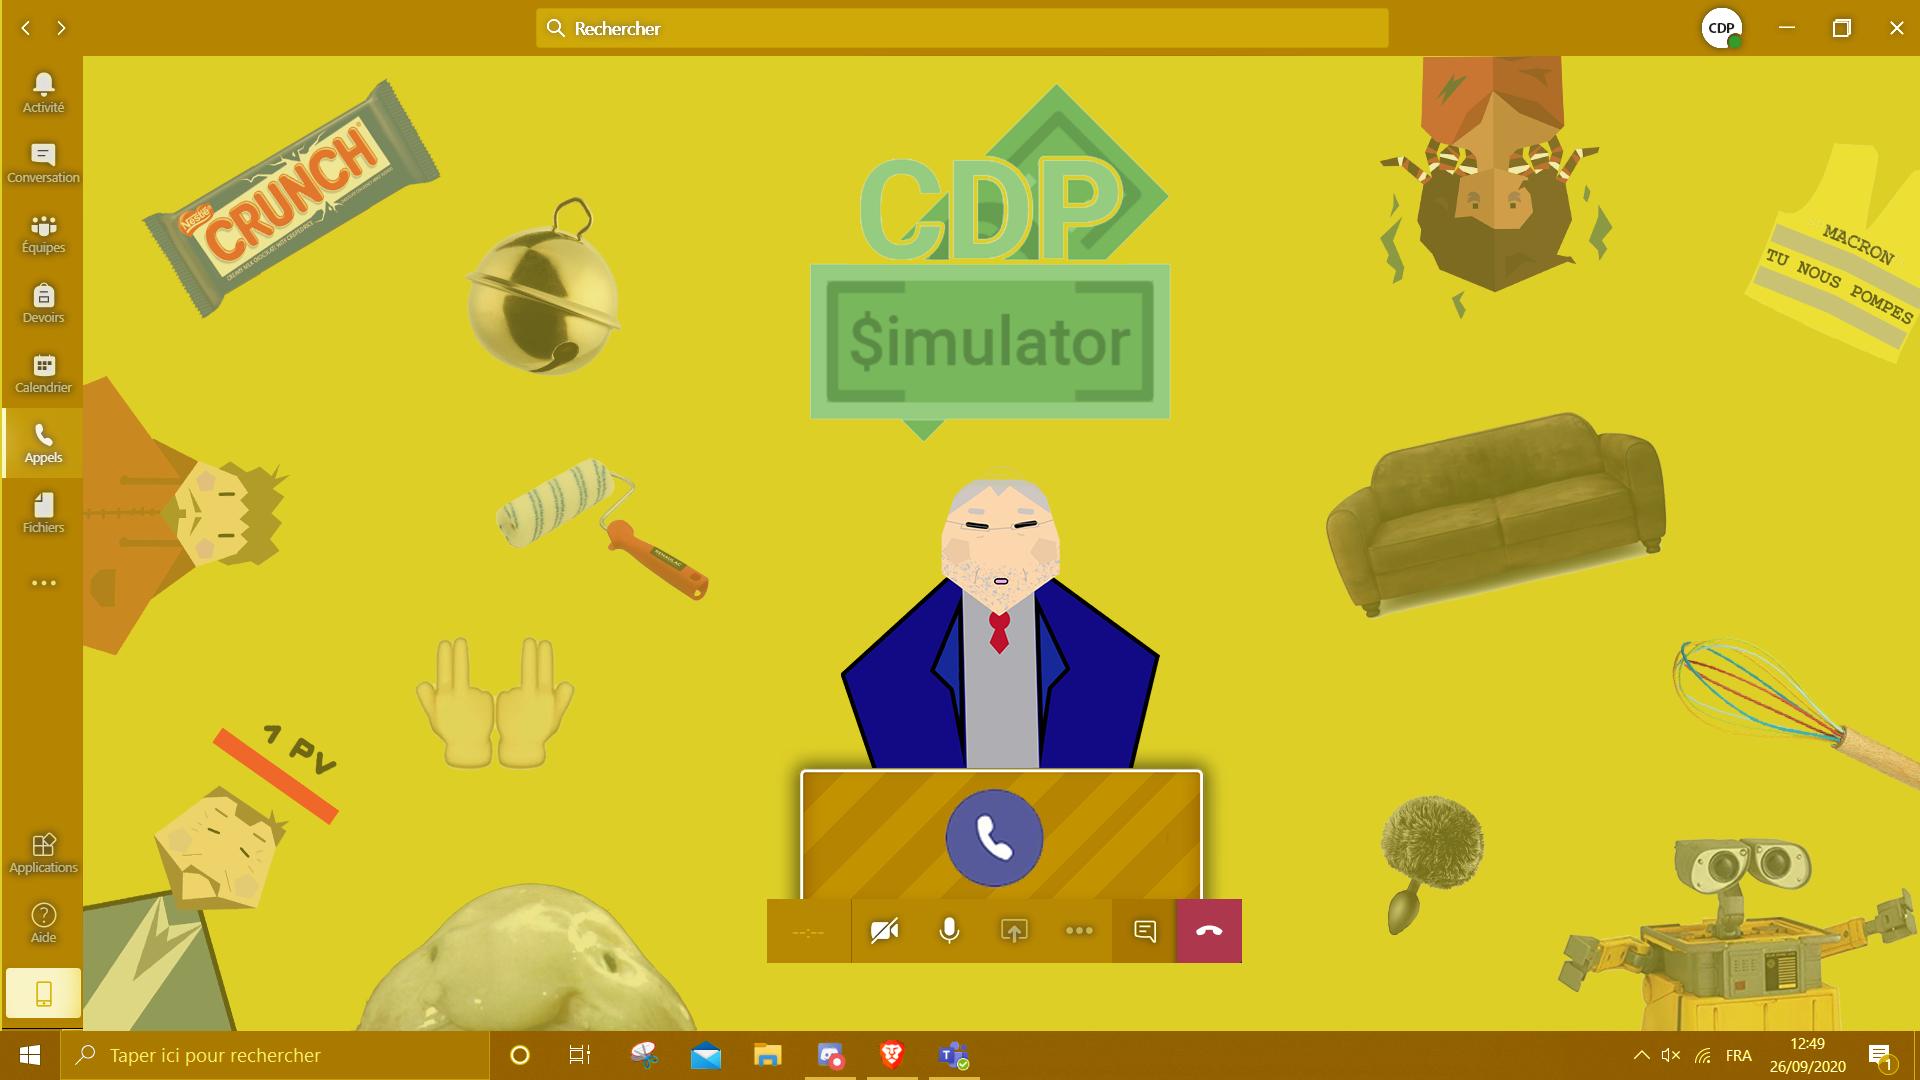 CDP SIMULATOR